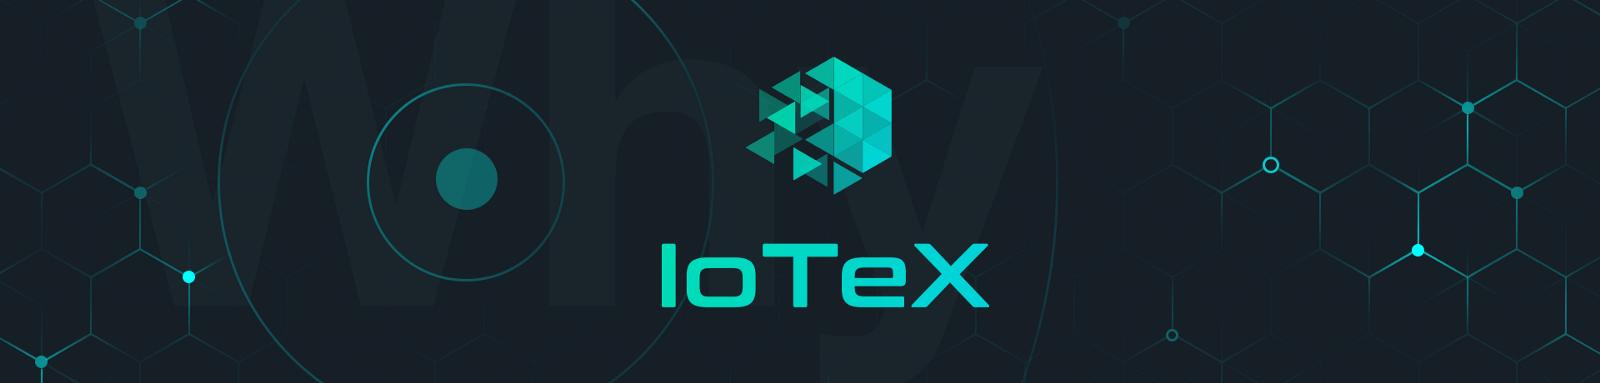 Por qué IoTeX va a revolucionar el IoT